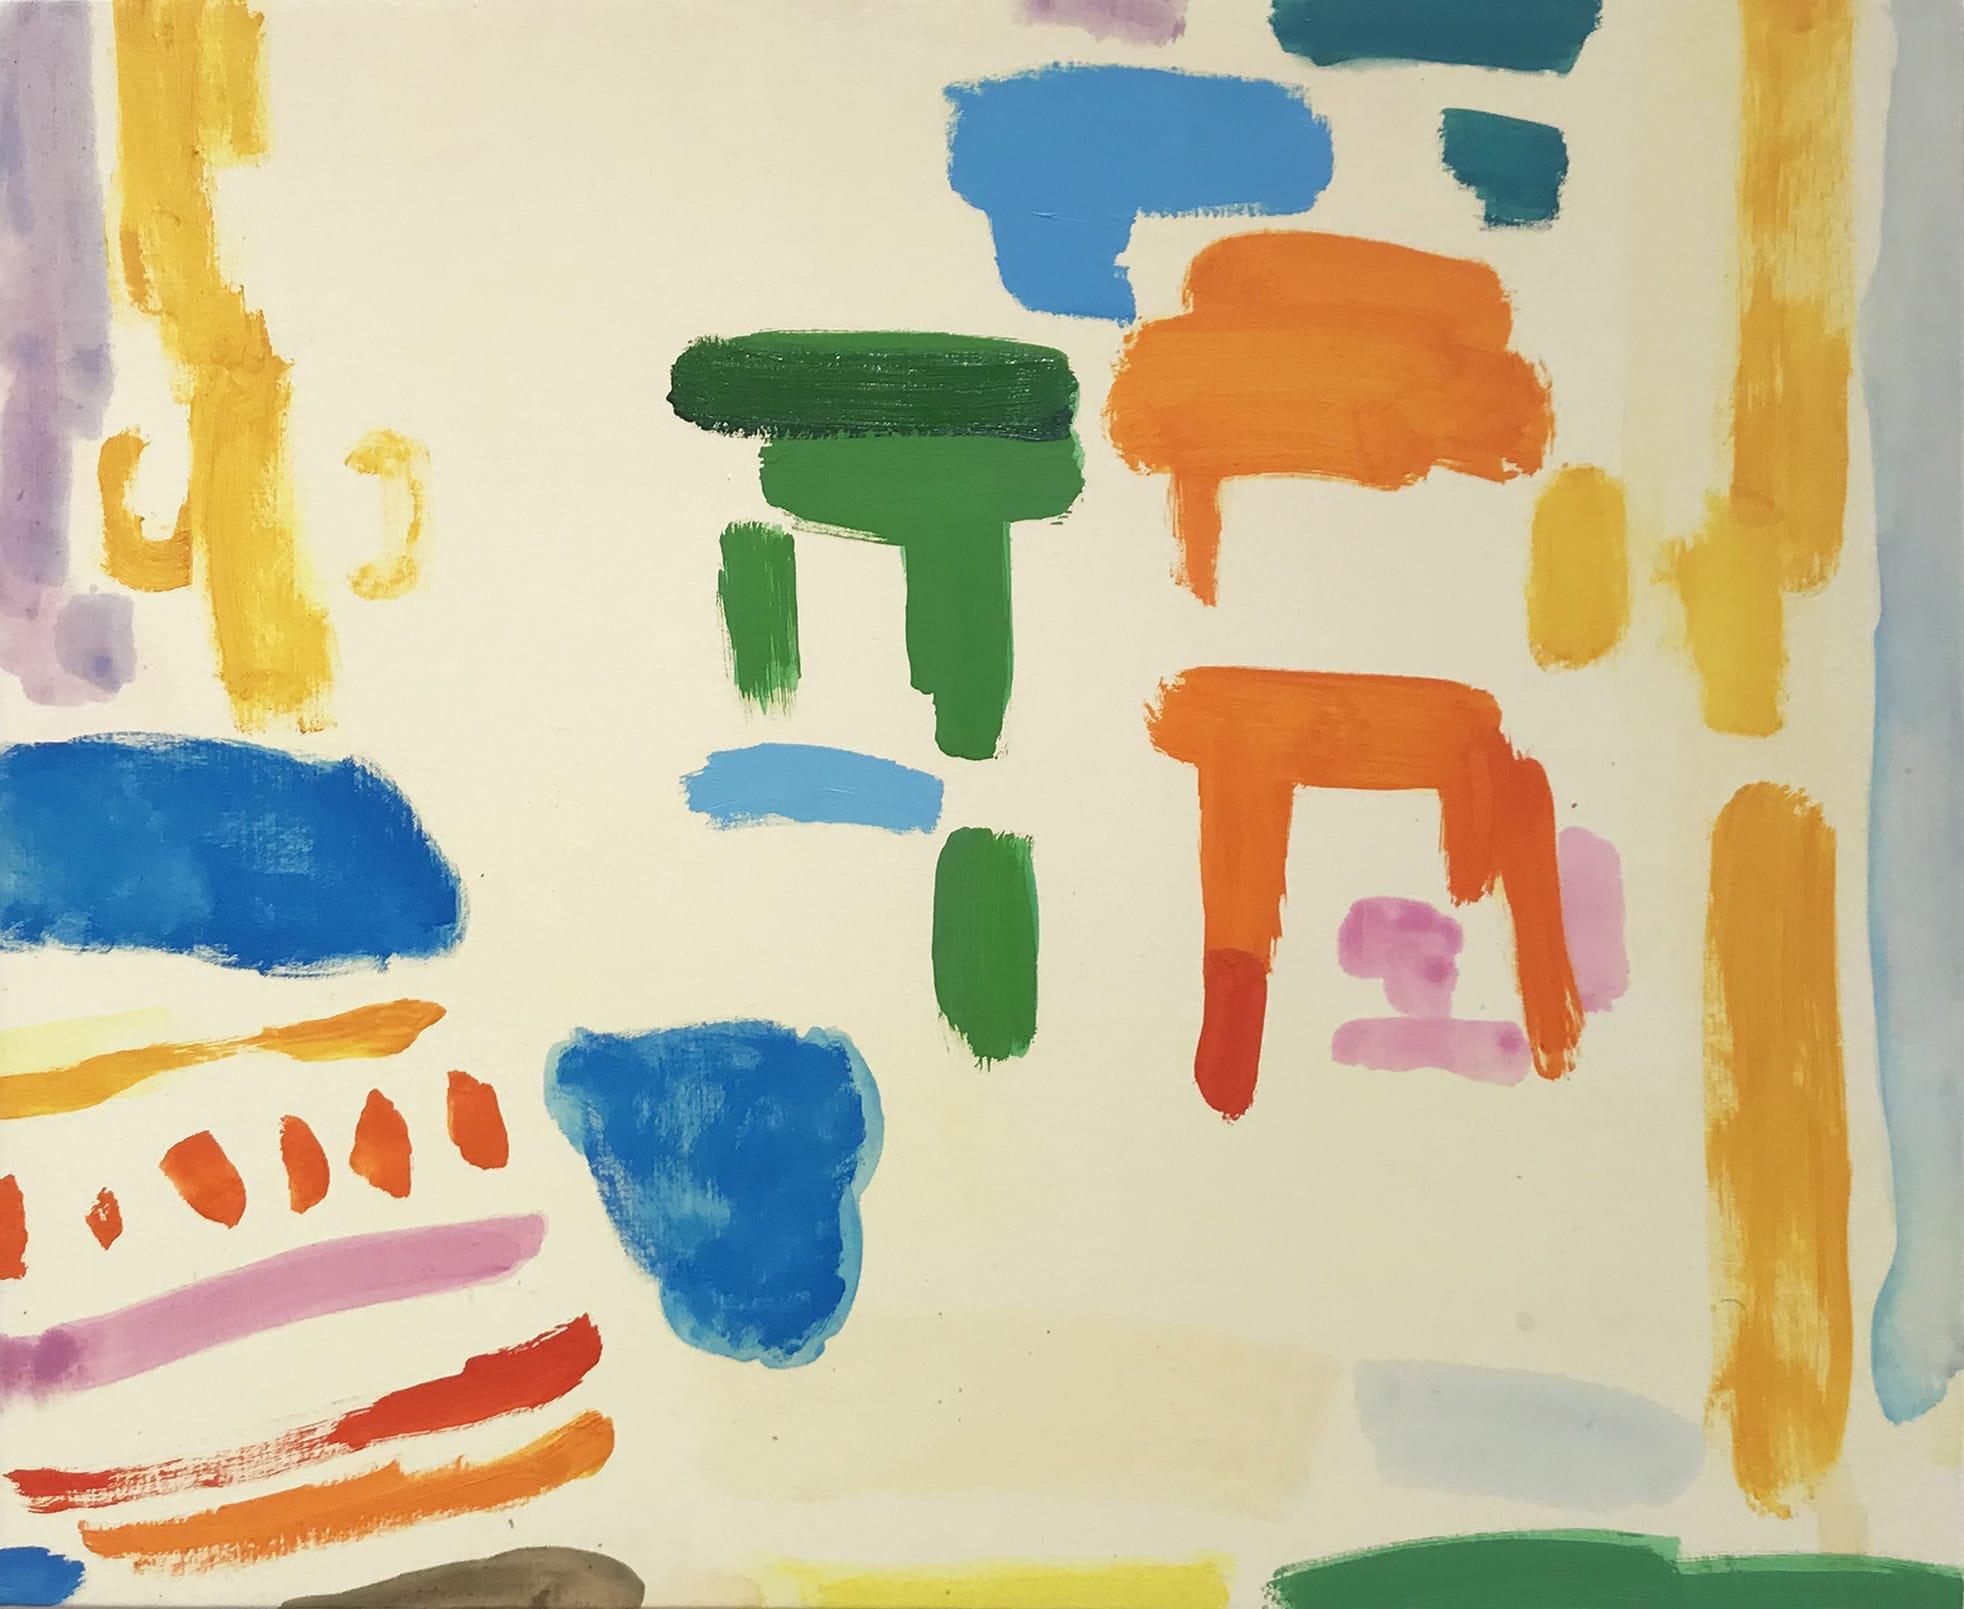 "<span class=""link fancybox-details-link""><a href=""/exhibitions/21/works/artworks1044/"">View Detail Page</a></span><div class=""artist""><strong>Tim Braden</strong></div> b.1975<div class=""title""><em>Cadmium orange chair</em>, 2019</div><div class=""medium"">oil on canvas on board</div><div class=""dimensions"">51 x 61cm (20x24"")<br></div>"